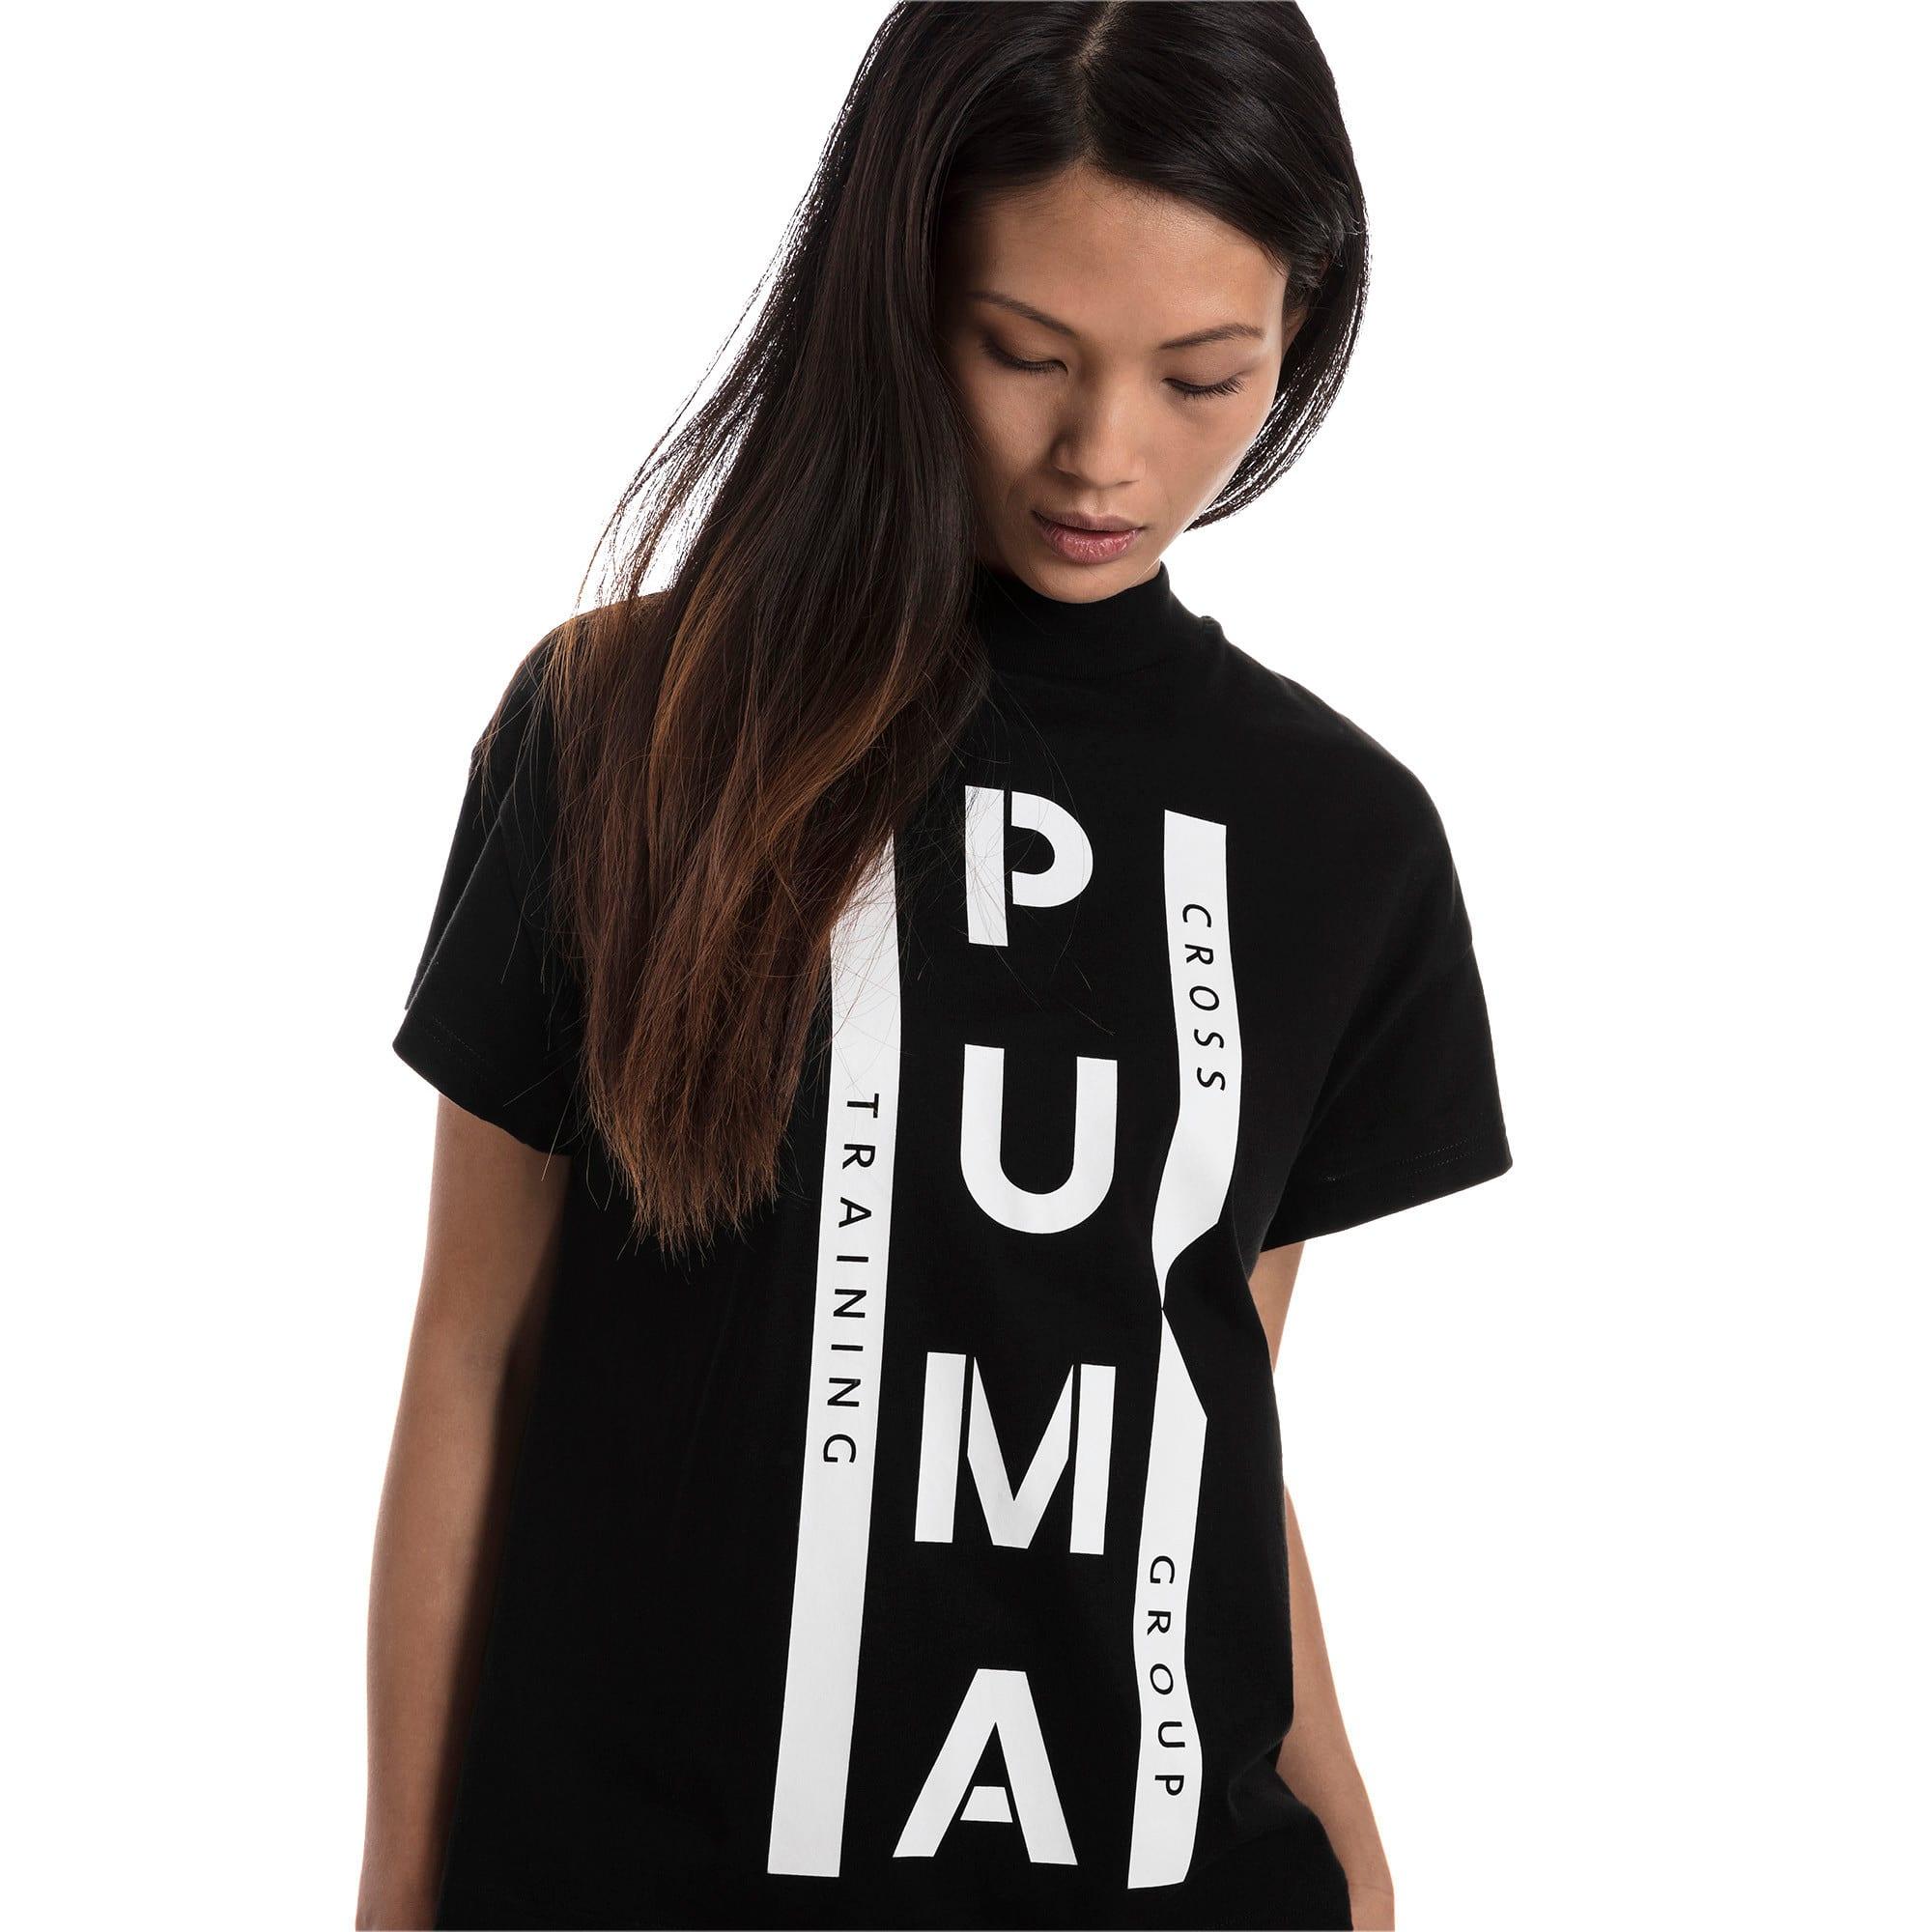 Thumbnail 2 of PUMA XTG グラフィック ウィメンズ SS Tシャツ 半袖, Cotton Black, medium-JPN